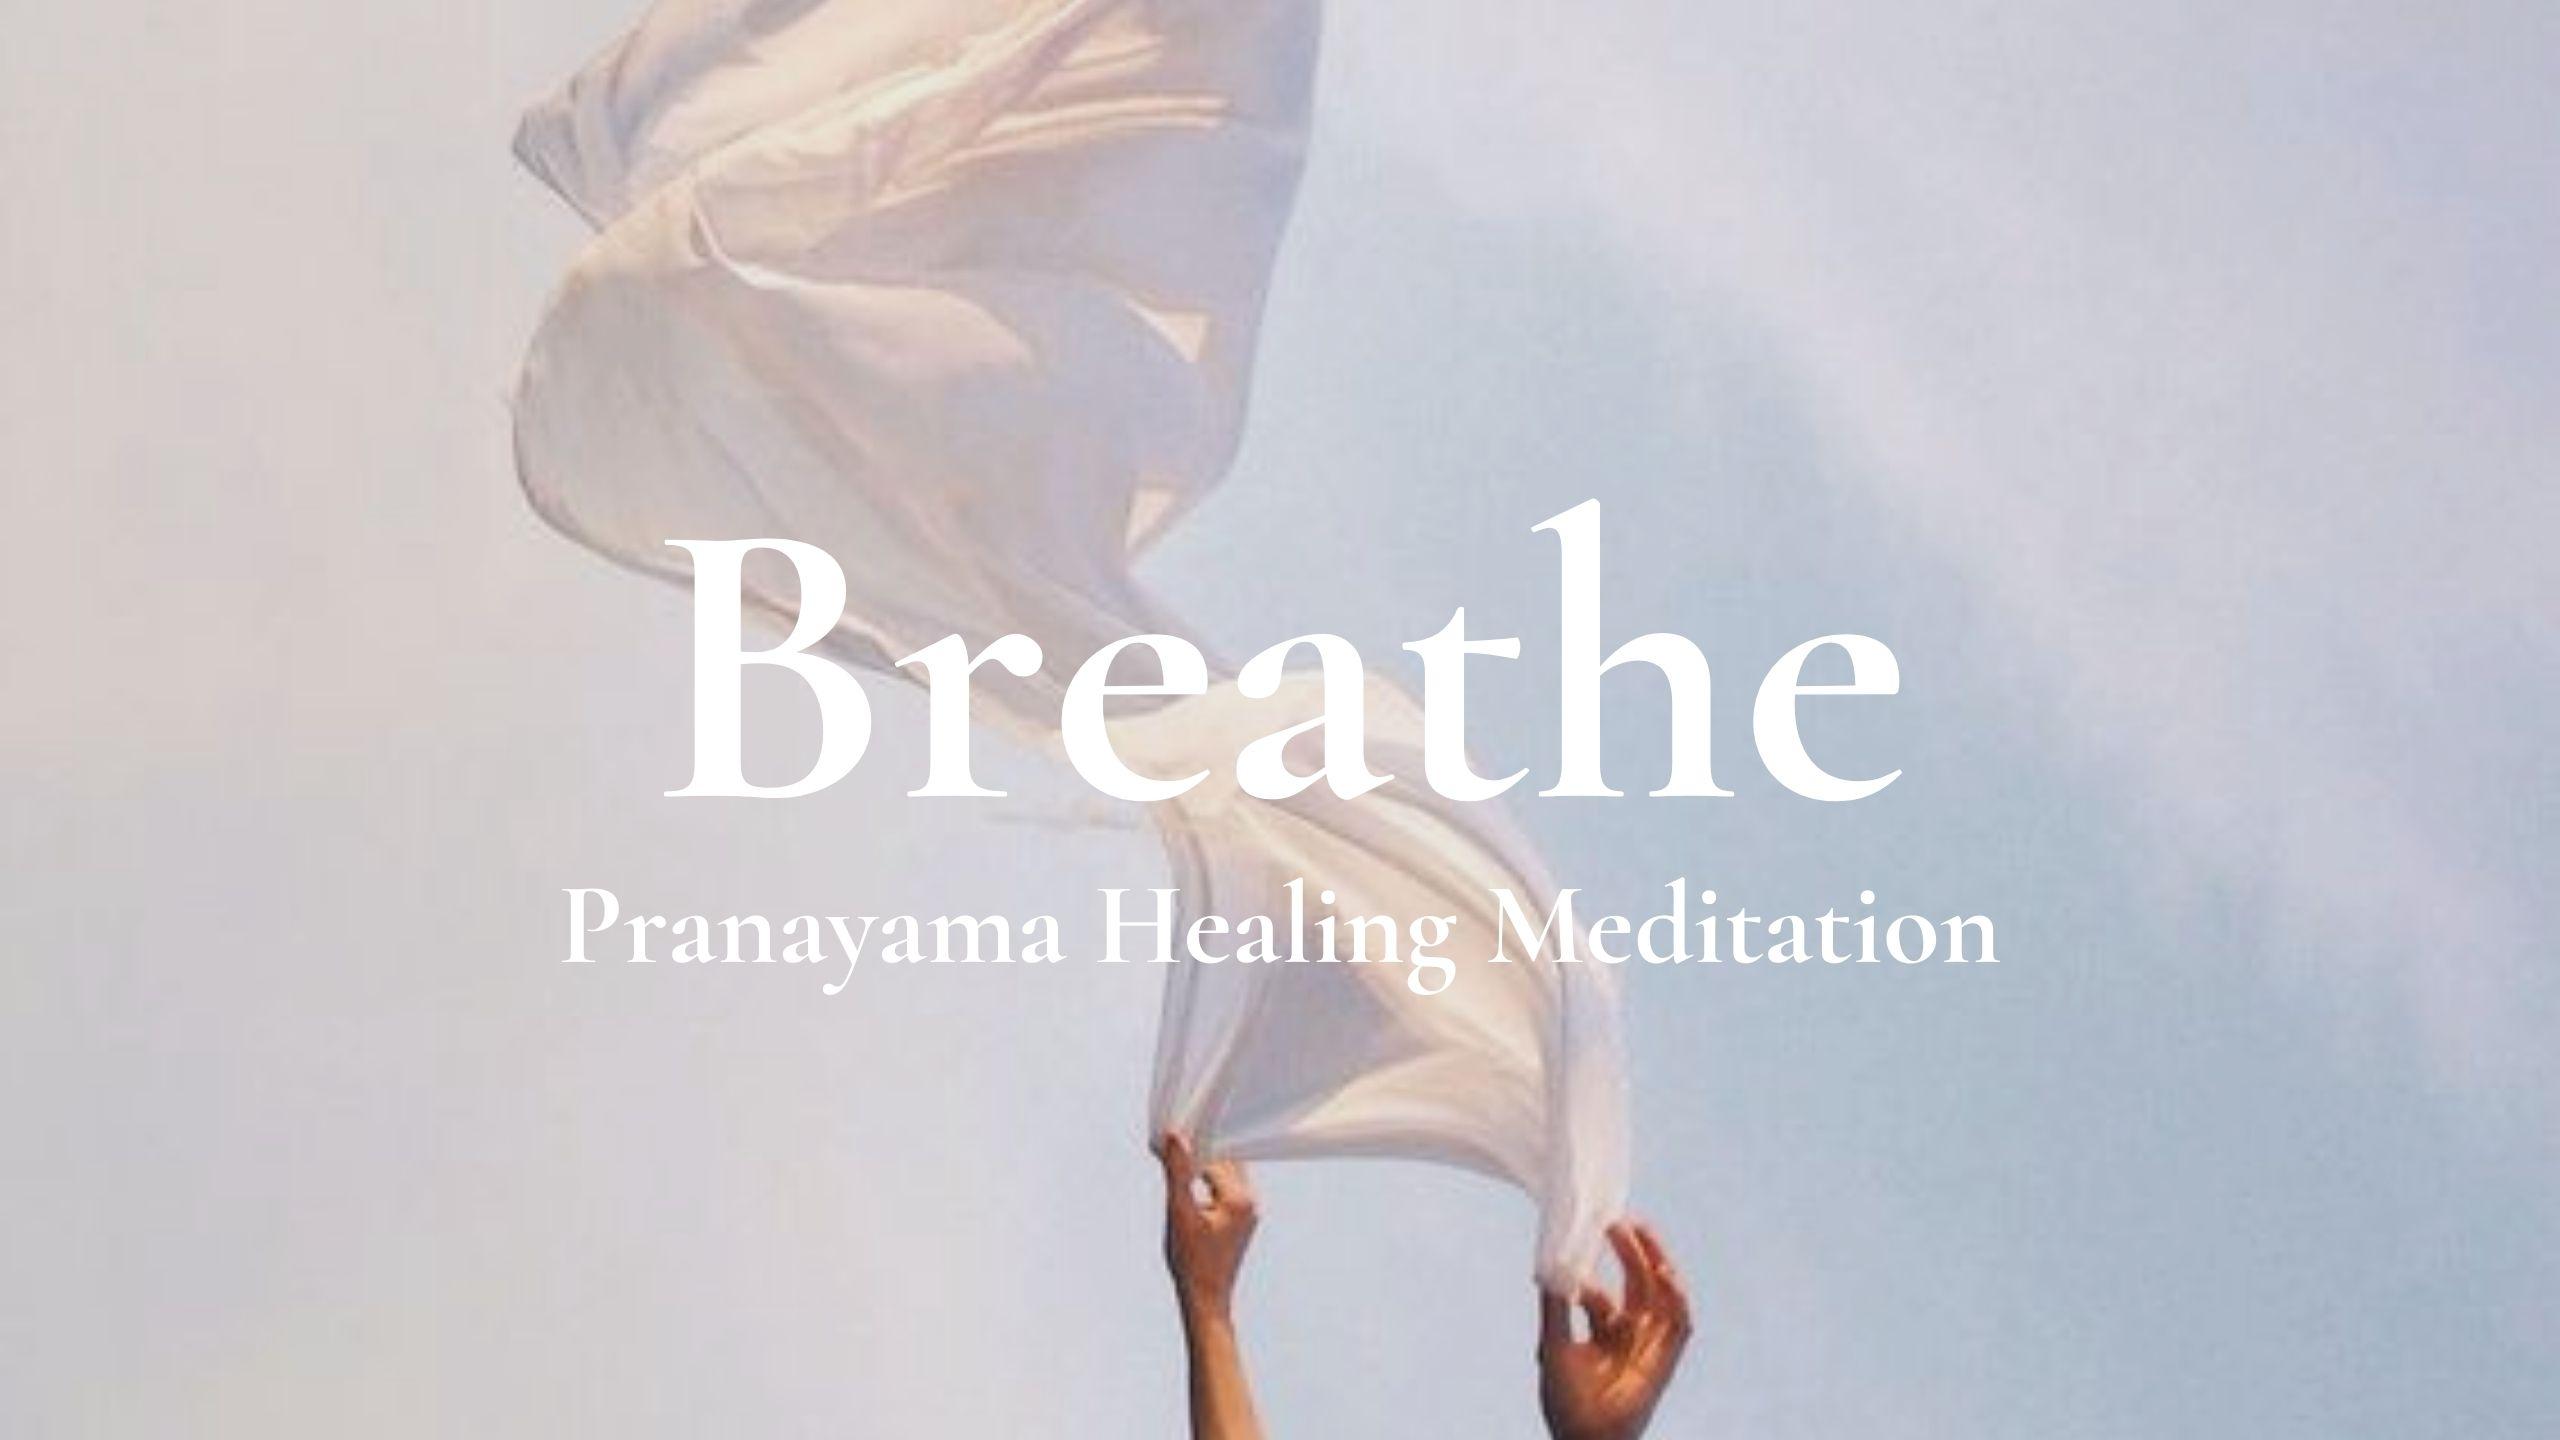 breathe pranayama